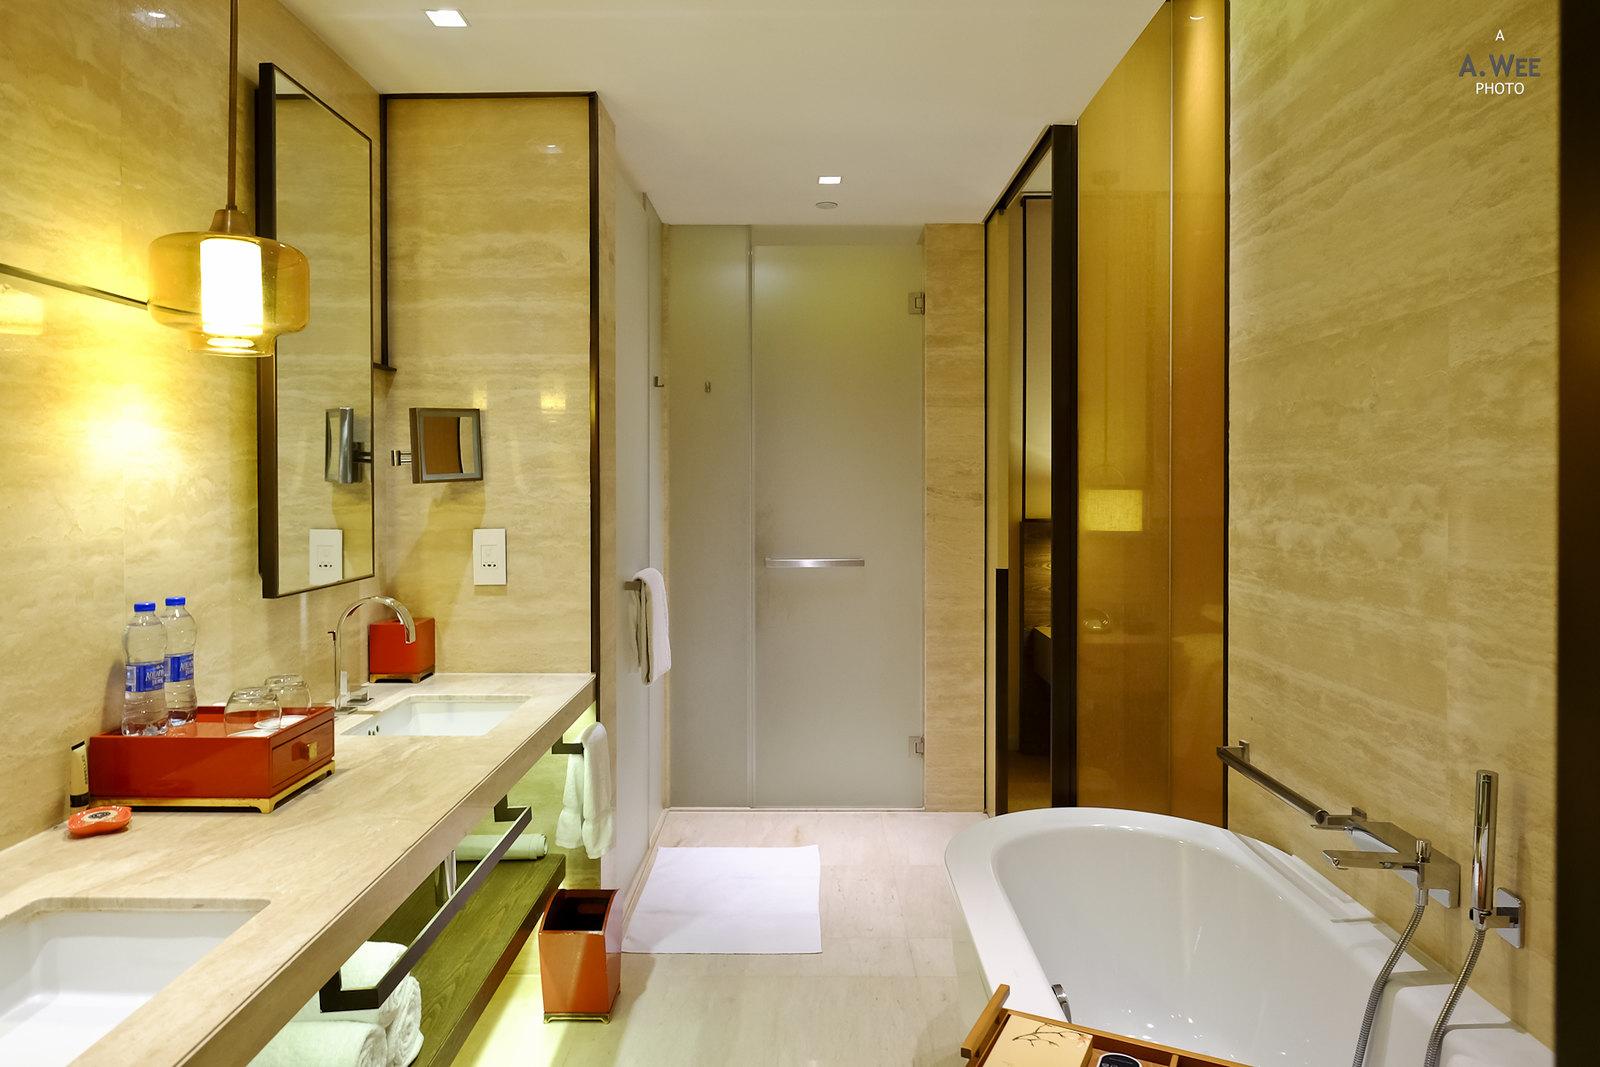 Bathtub and vanity